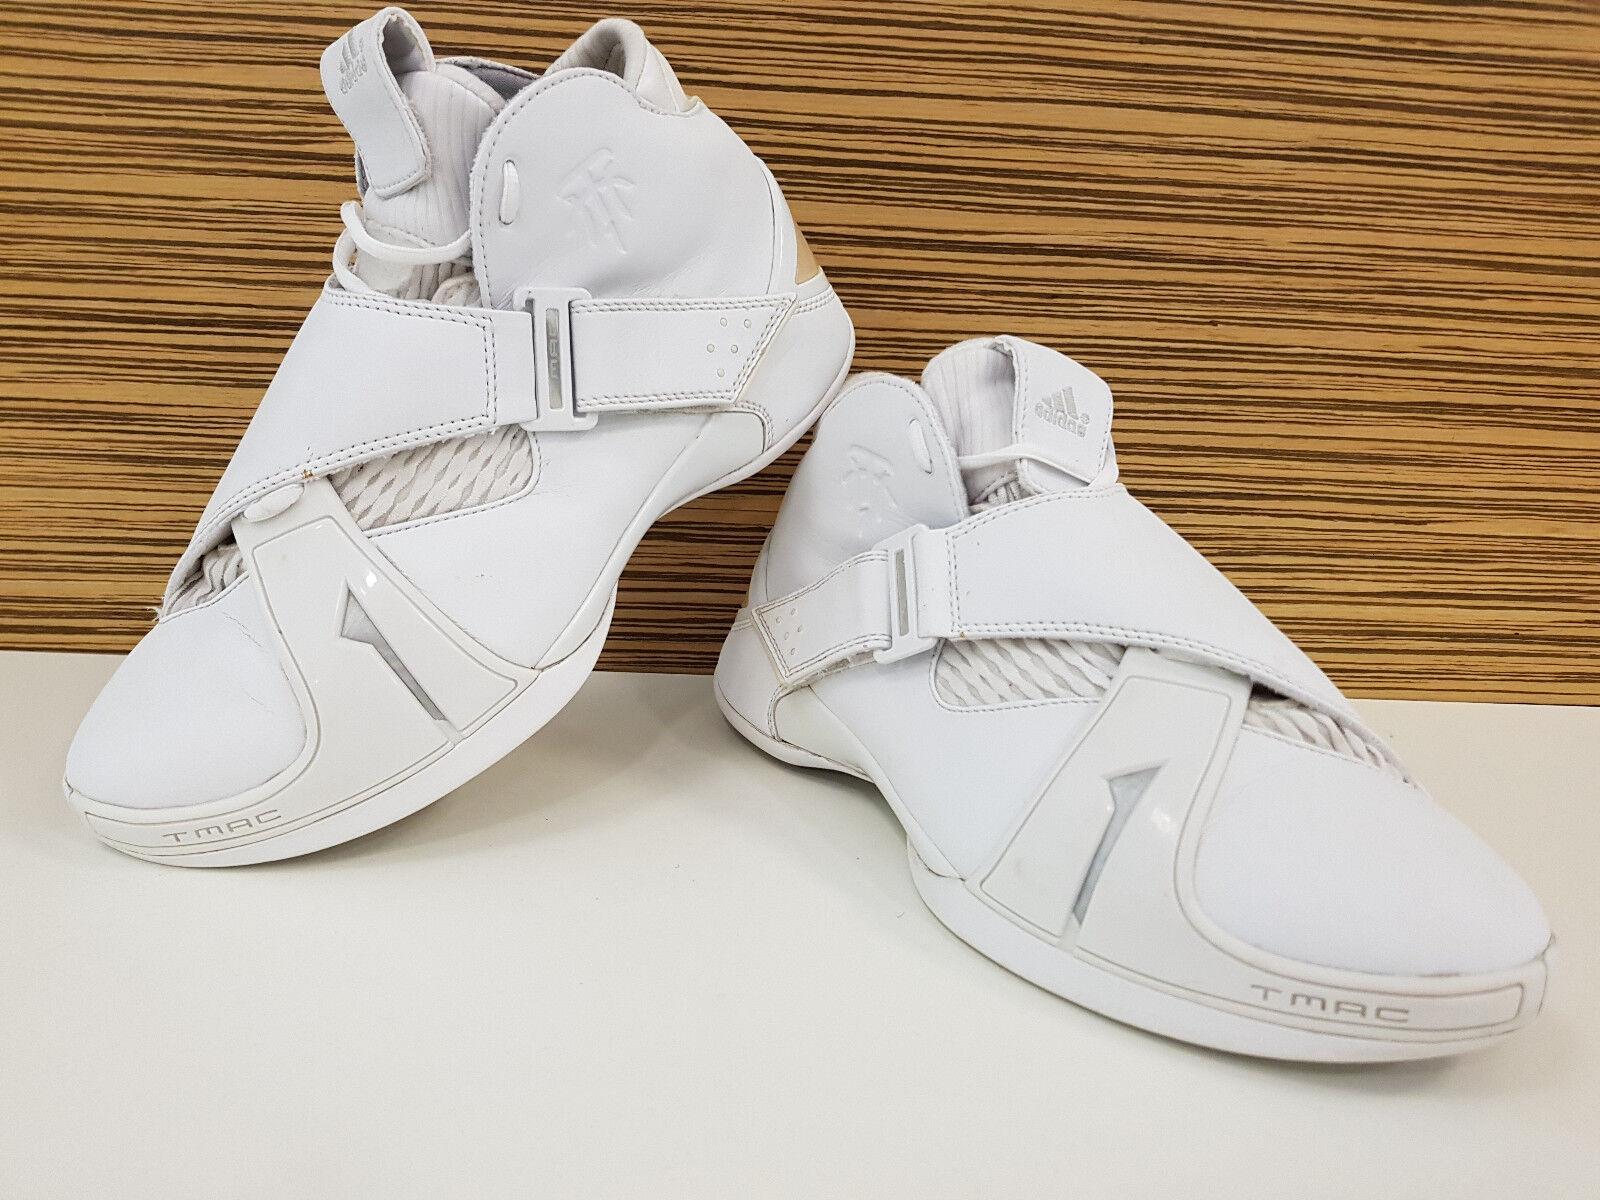 Legendäre Adidas TMAC 5 TRACY MC GRADY Basketball Schuhe Sneaker  9 = 43 – 43,5